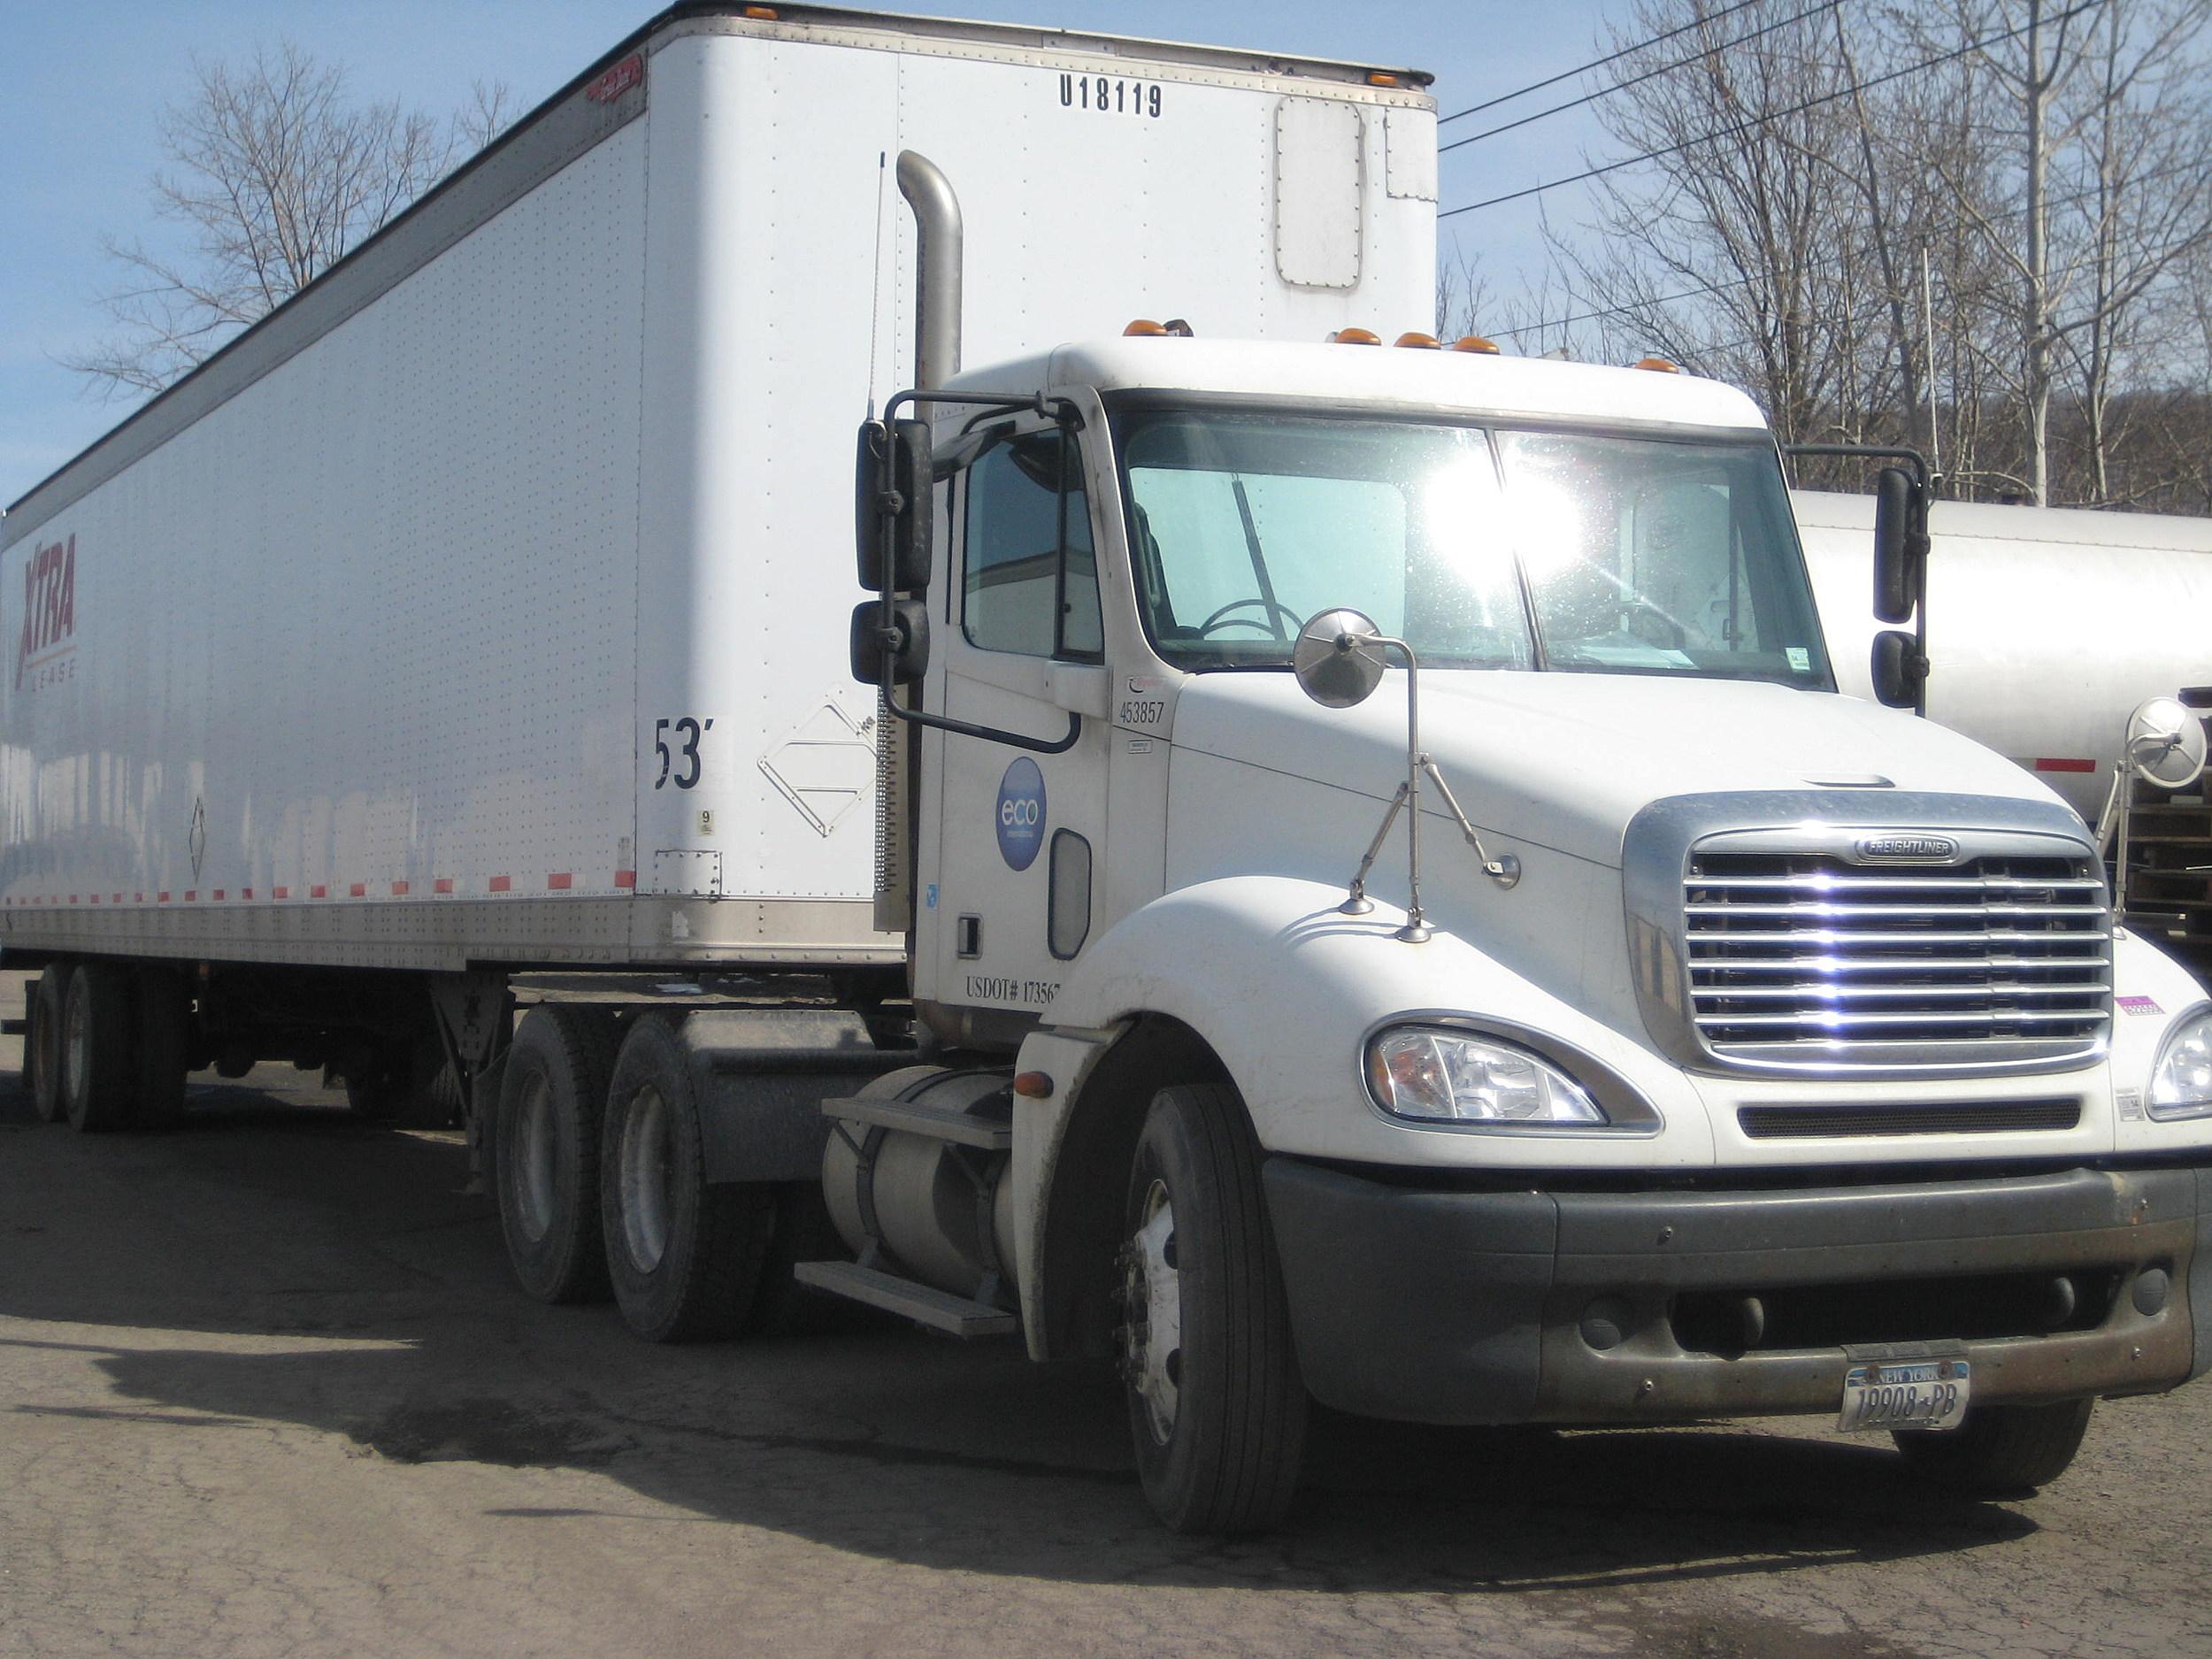 No Serious Injuries In Richford Van Tractor Trailer Crash